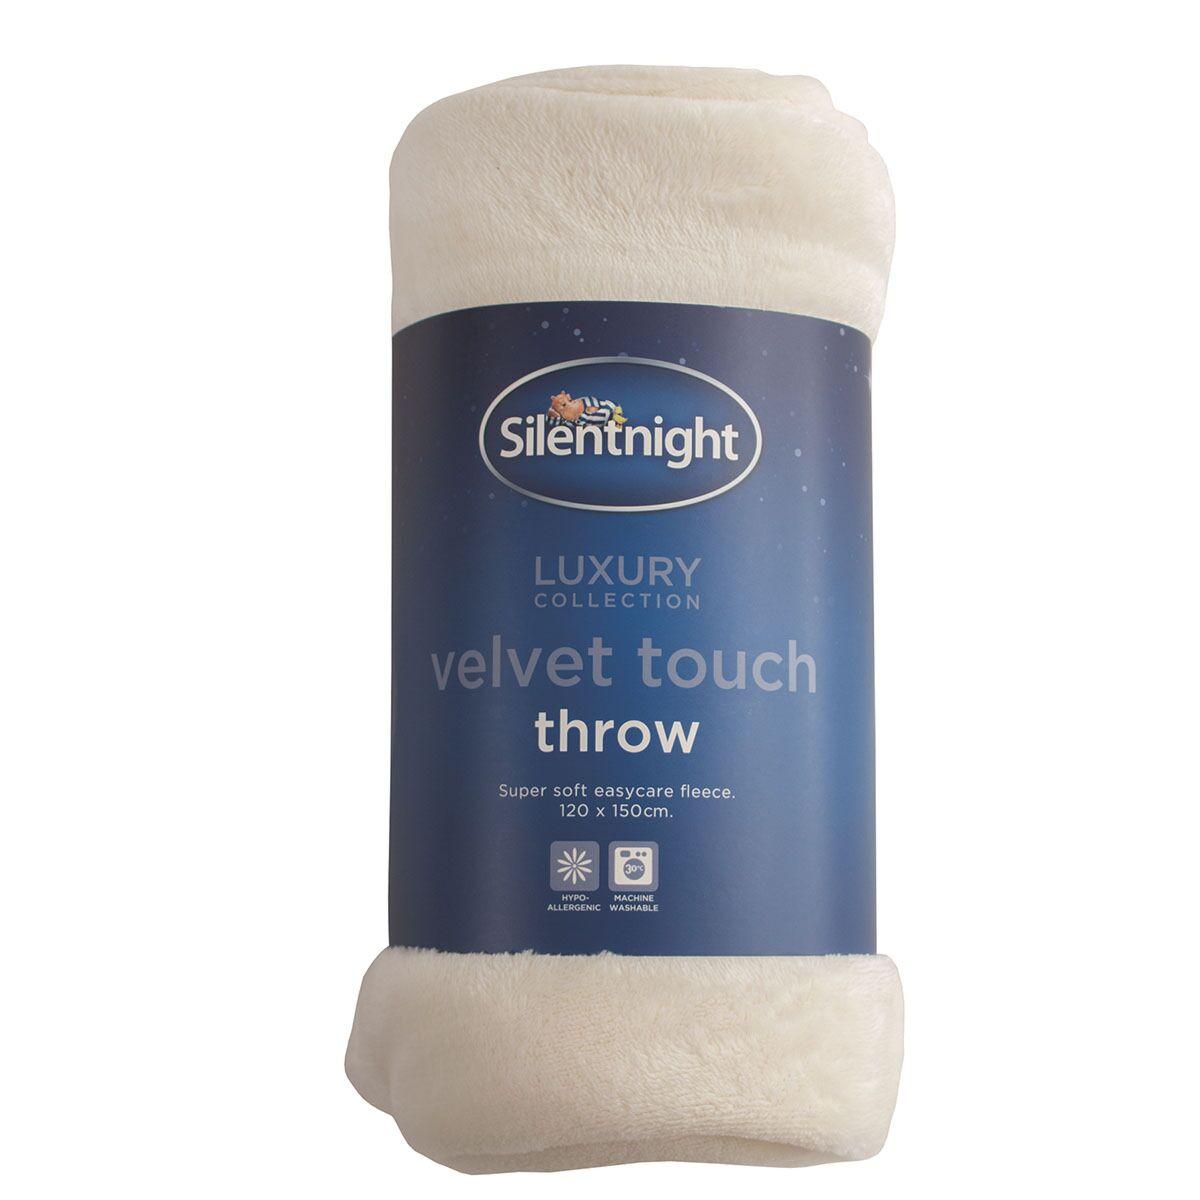 Robert Dyas - Silentnight Hazy Flannel Fleece Throw 120 x 150cm - Grey/Cream - £3 - Free C&C